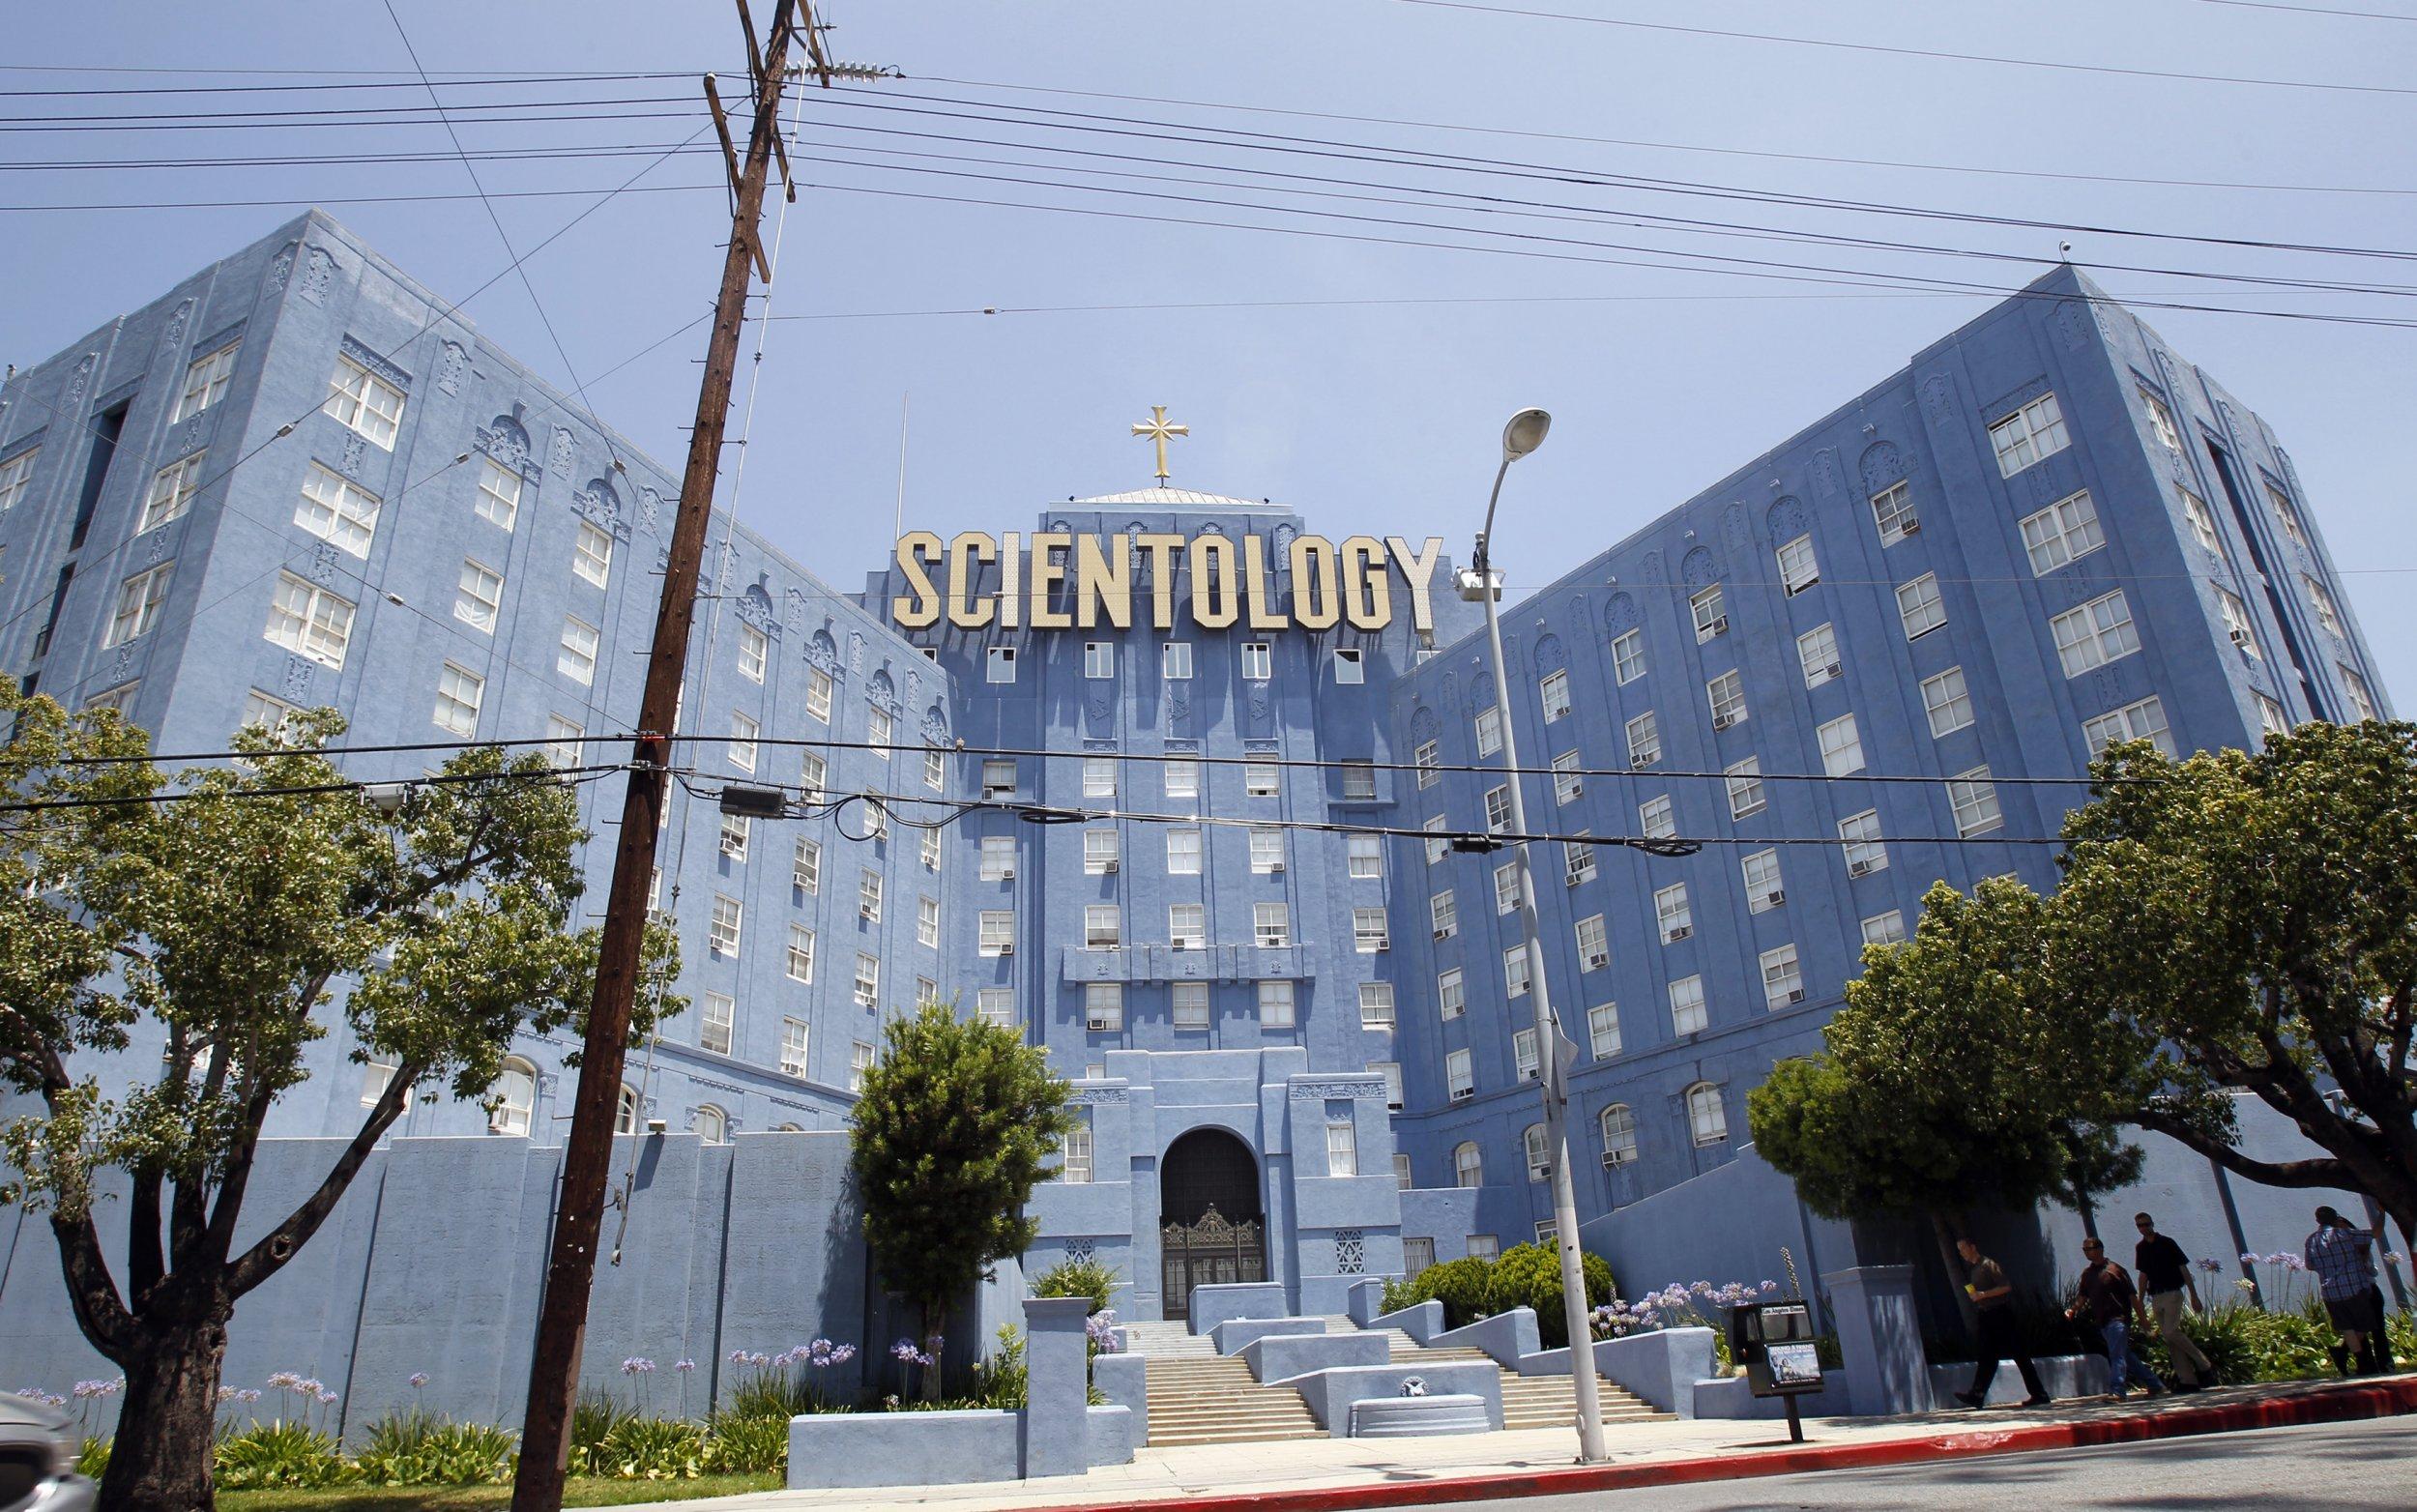 ScientologyLosAngeles